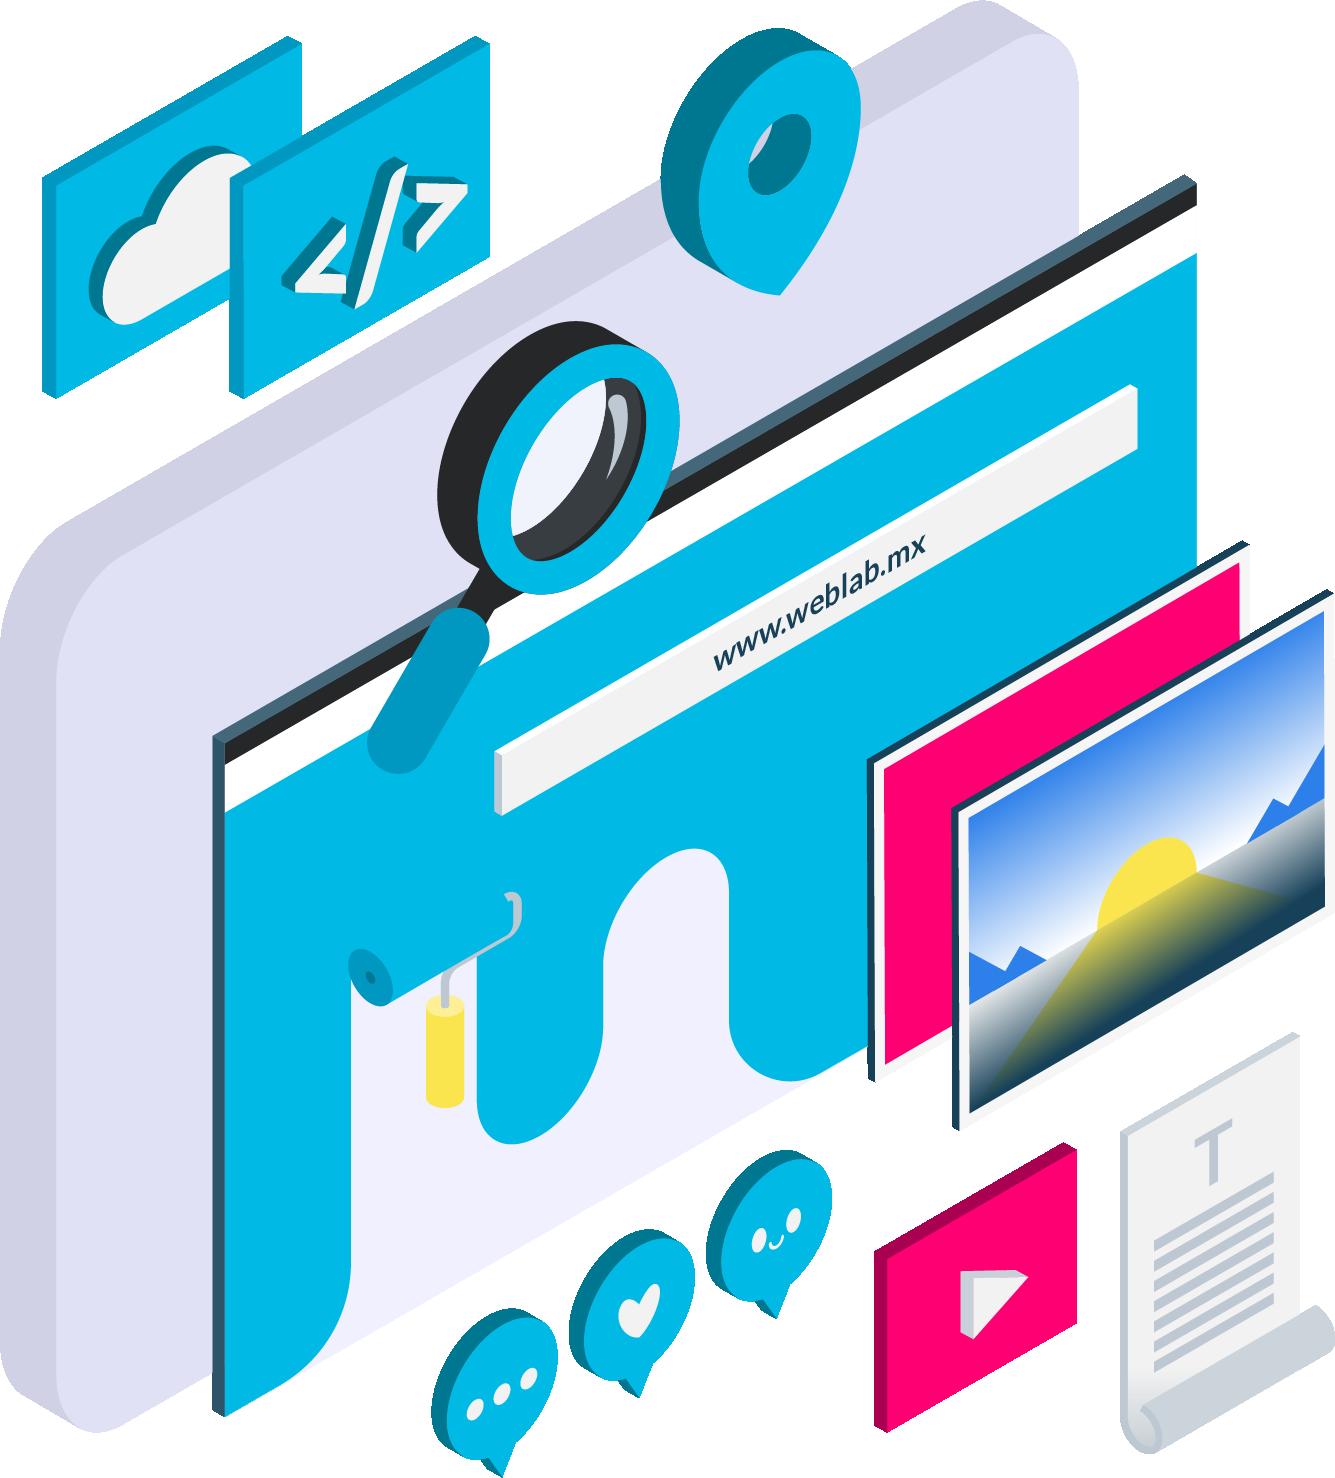 Administración de redes sociales | Social Manager